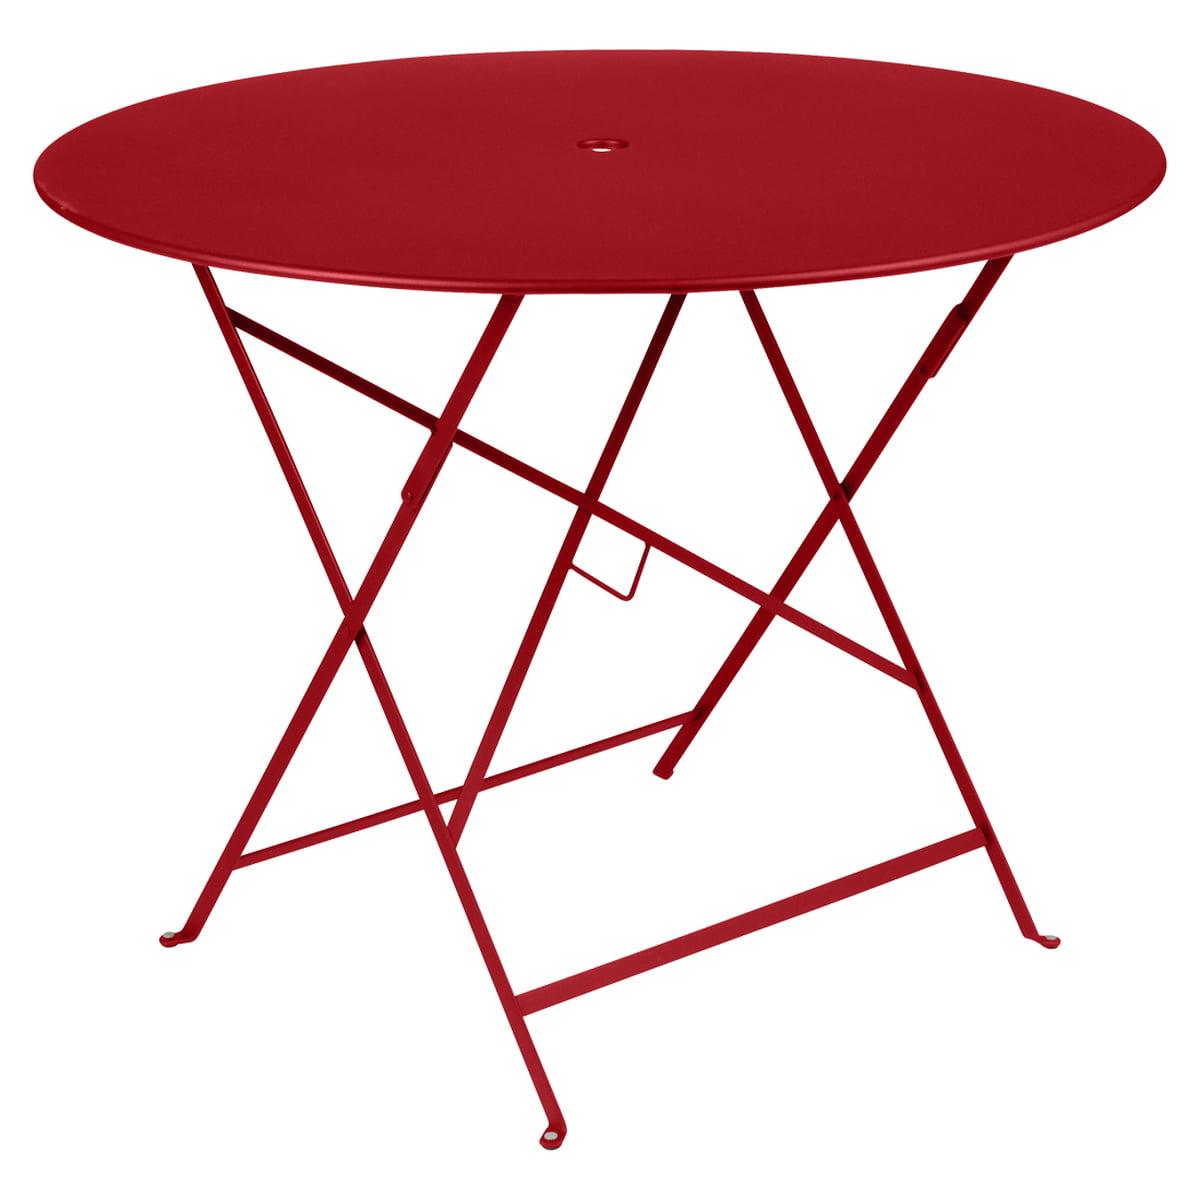 Pliante 96 Fermob Coton CmBlanc BistroRondØ Table OkliPuwTXZ